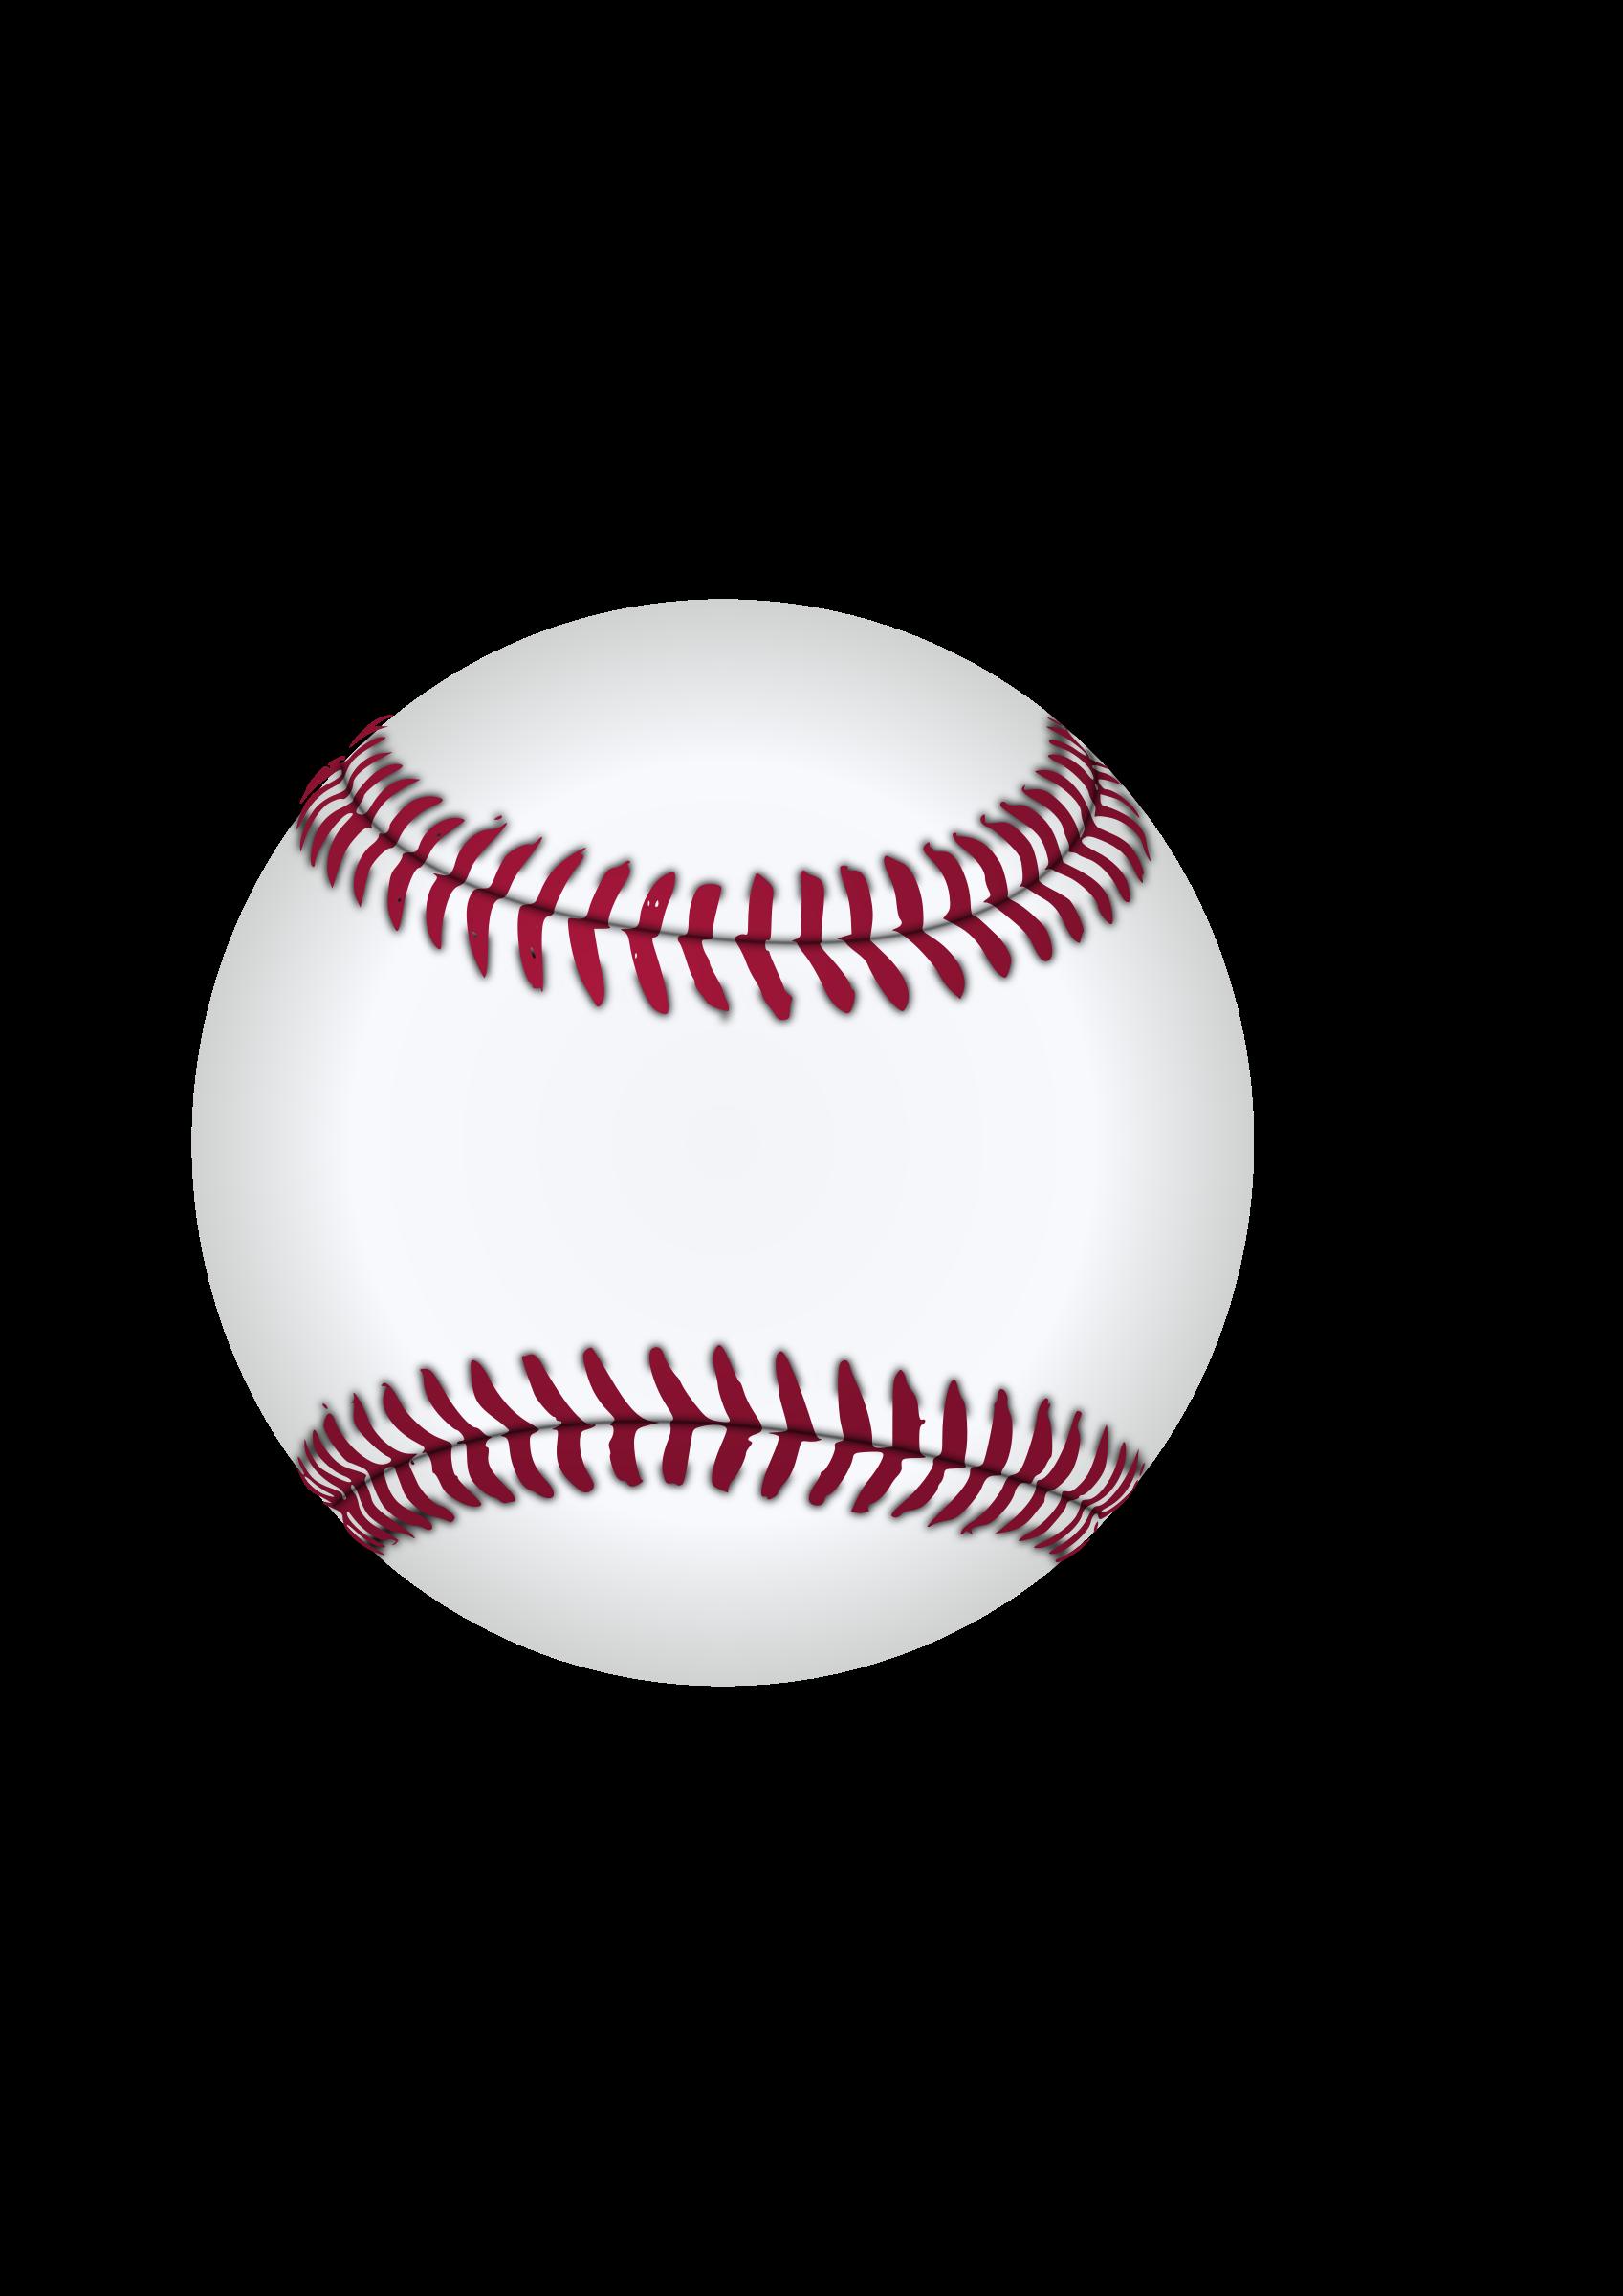 American baseball clipart banner transparent download Clipart - Baseball banner transparent download